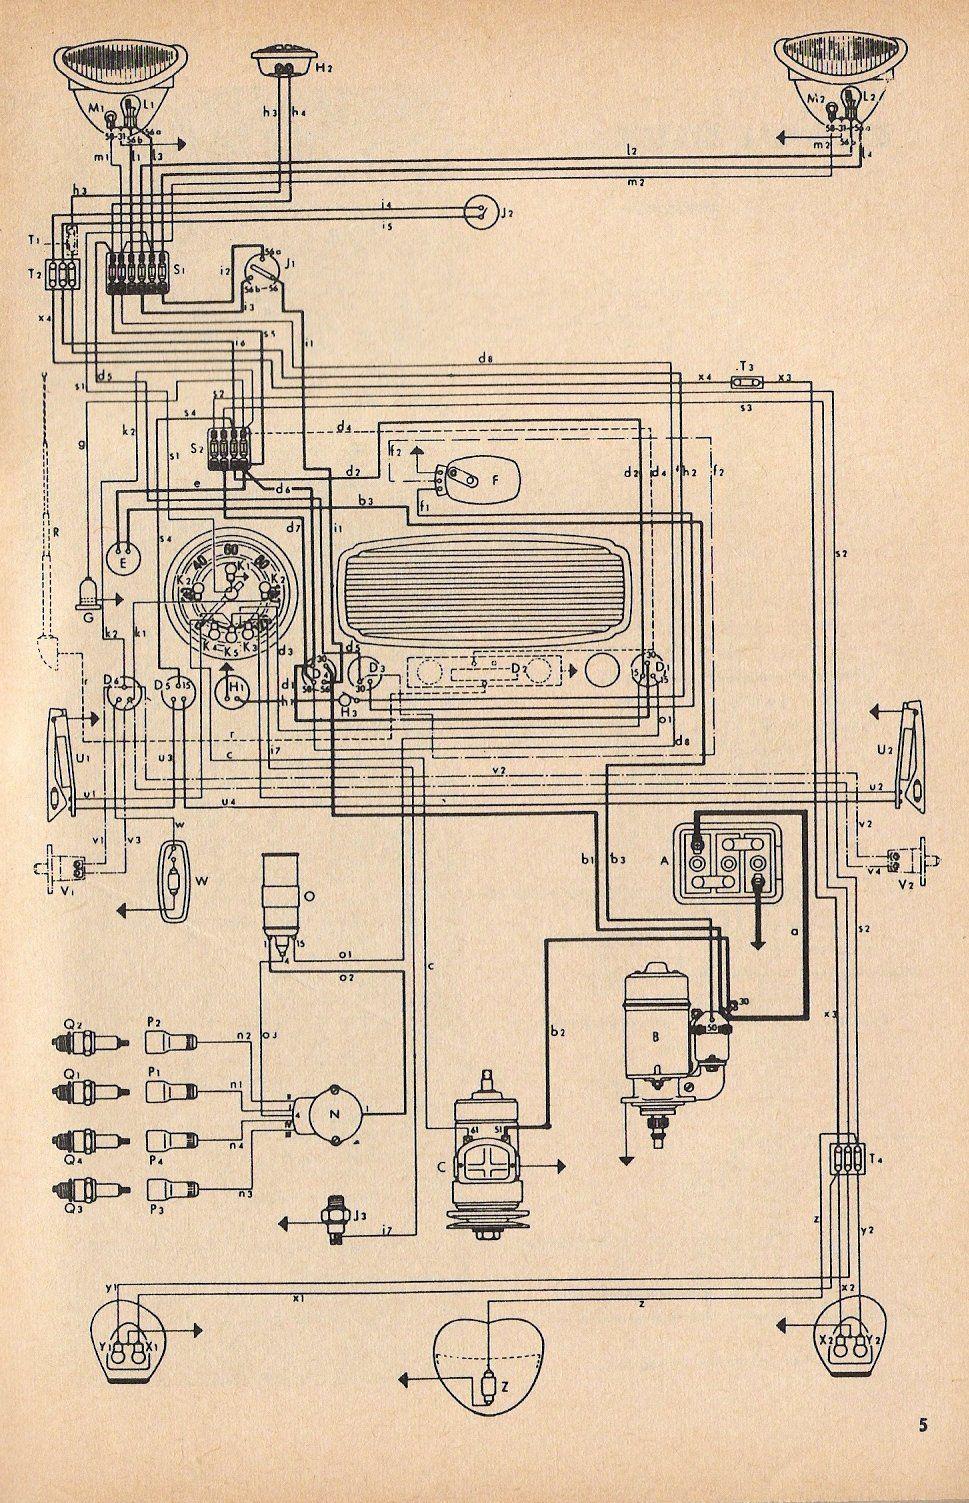 vw beetle 1960s blueprint  Google Search   VW Beetle   Vw beetles, Beetle, Vw classic